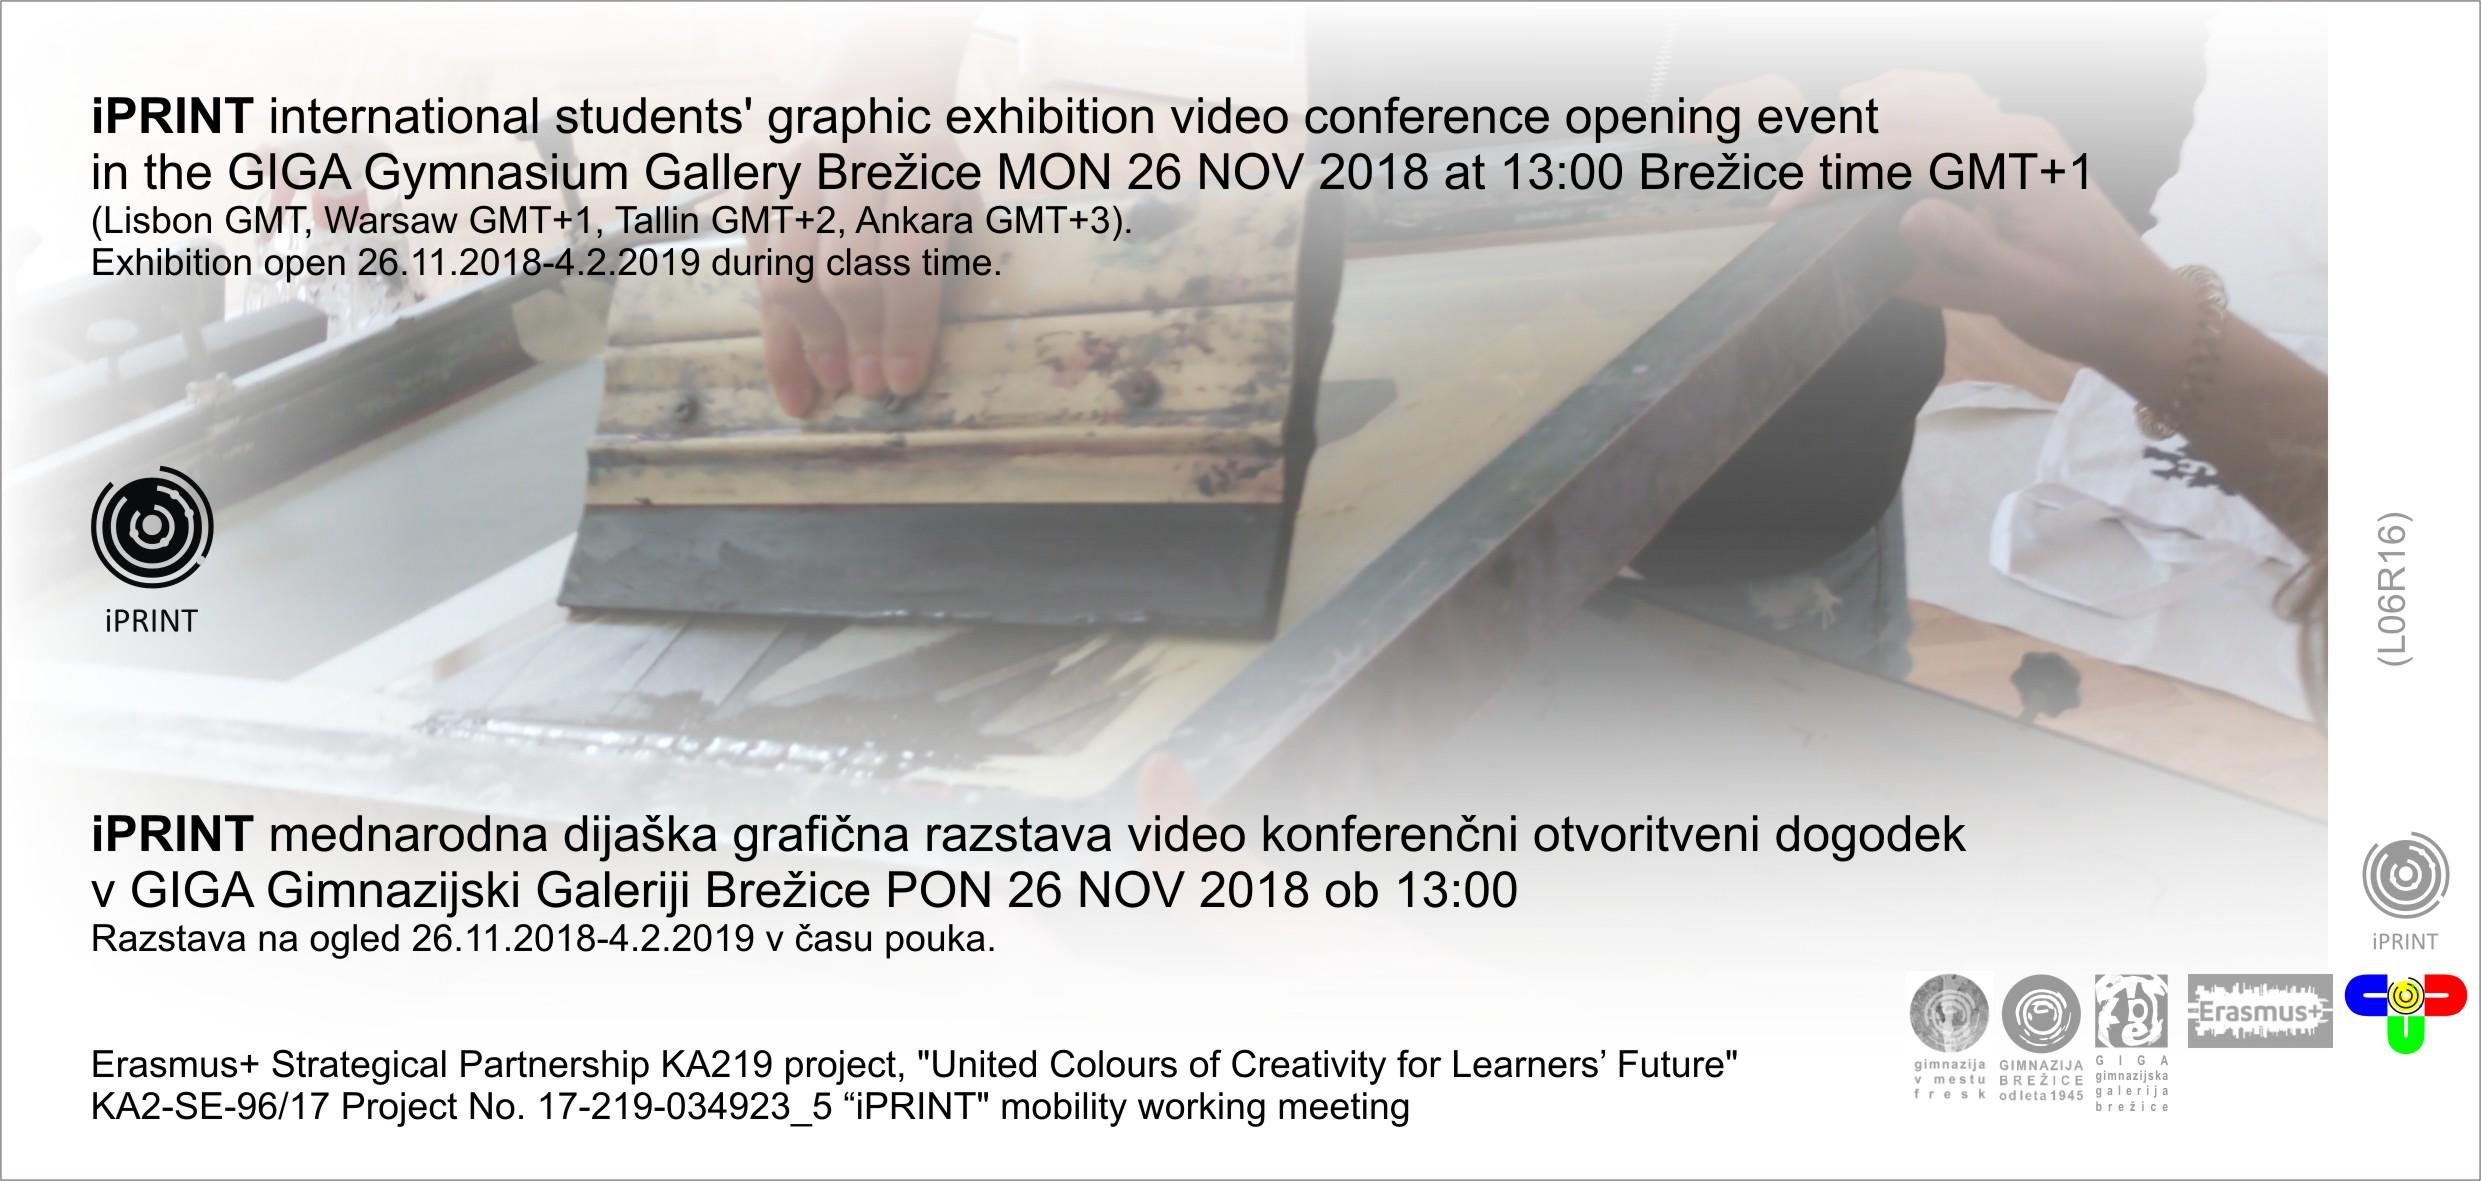 Vabilo na otvoritev iPRINT razstave